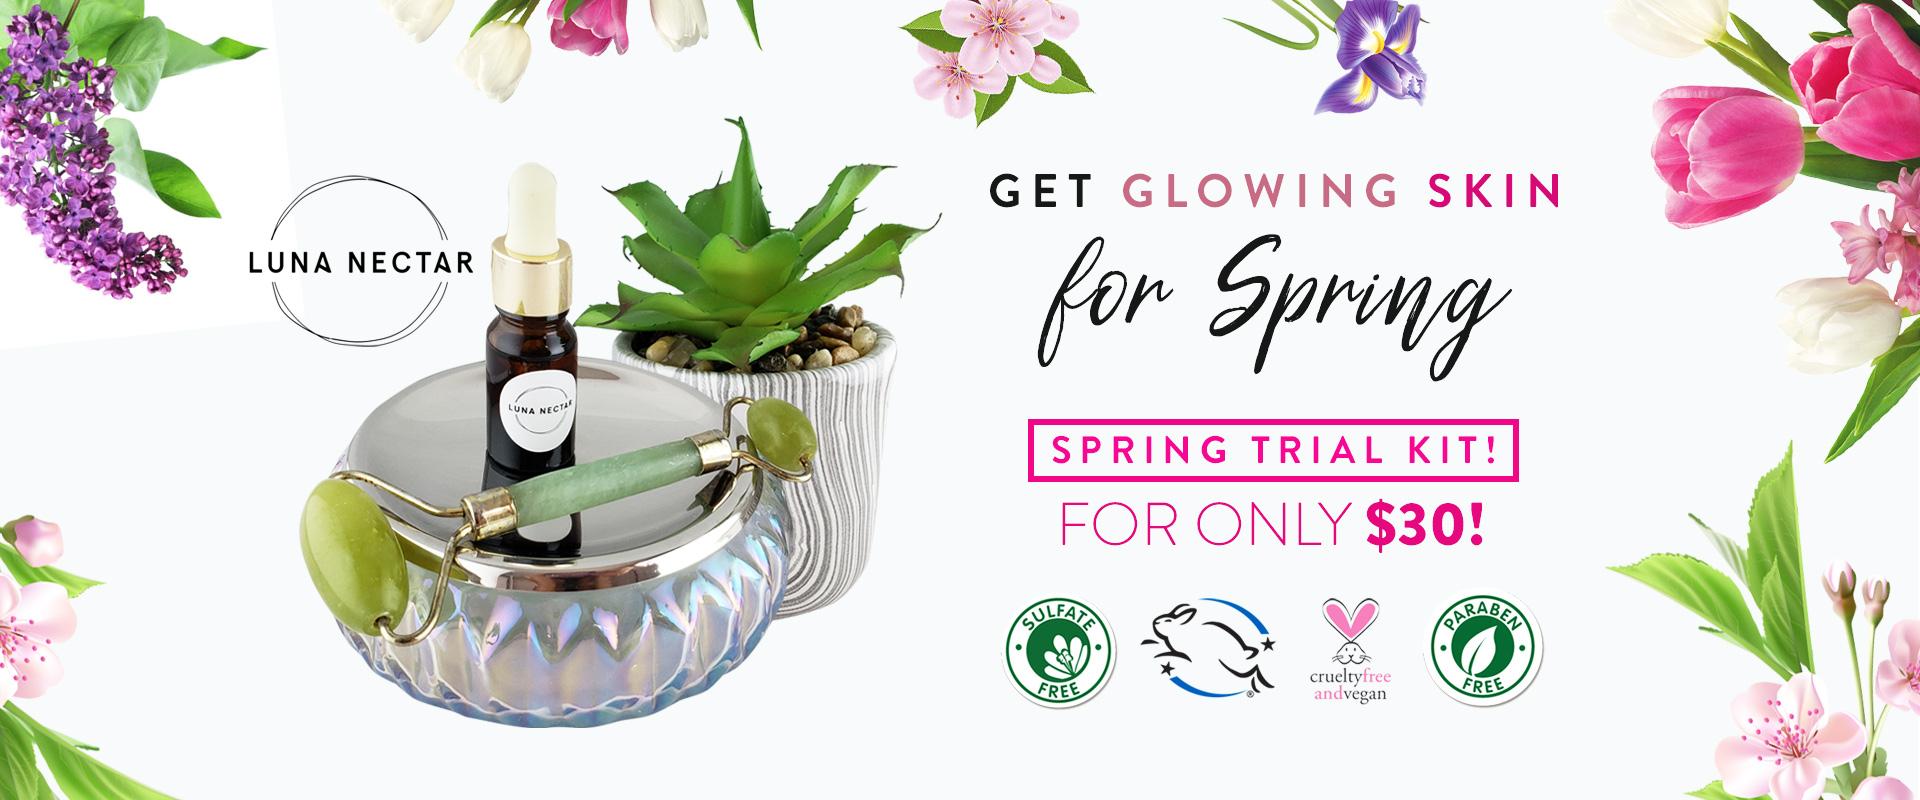 Luna Nectar jade roller and Heliophilia Glow & Fix Serum Spring Special